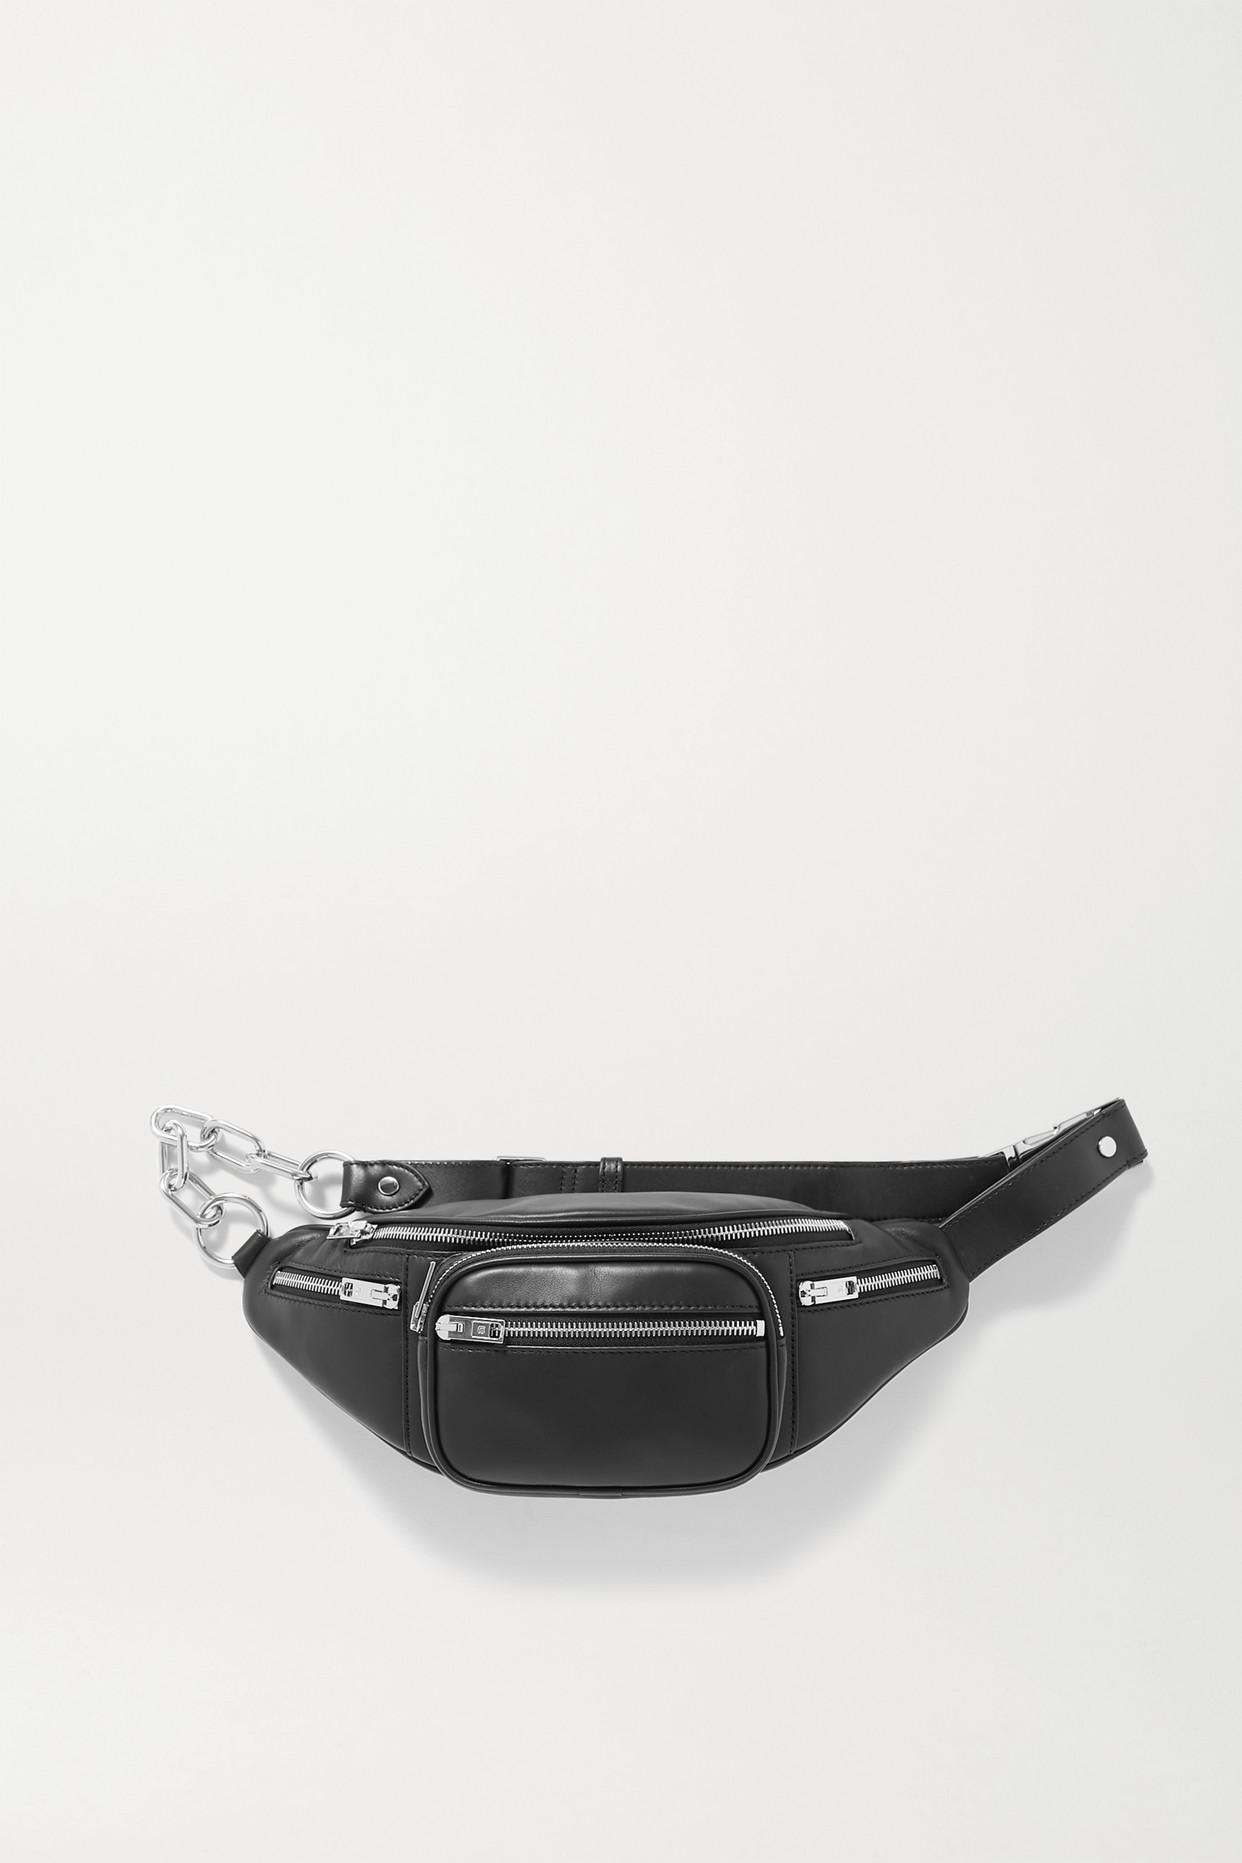 ALEXANDER WANG - Attica Leather Belt Bag - Black - one size